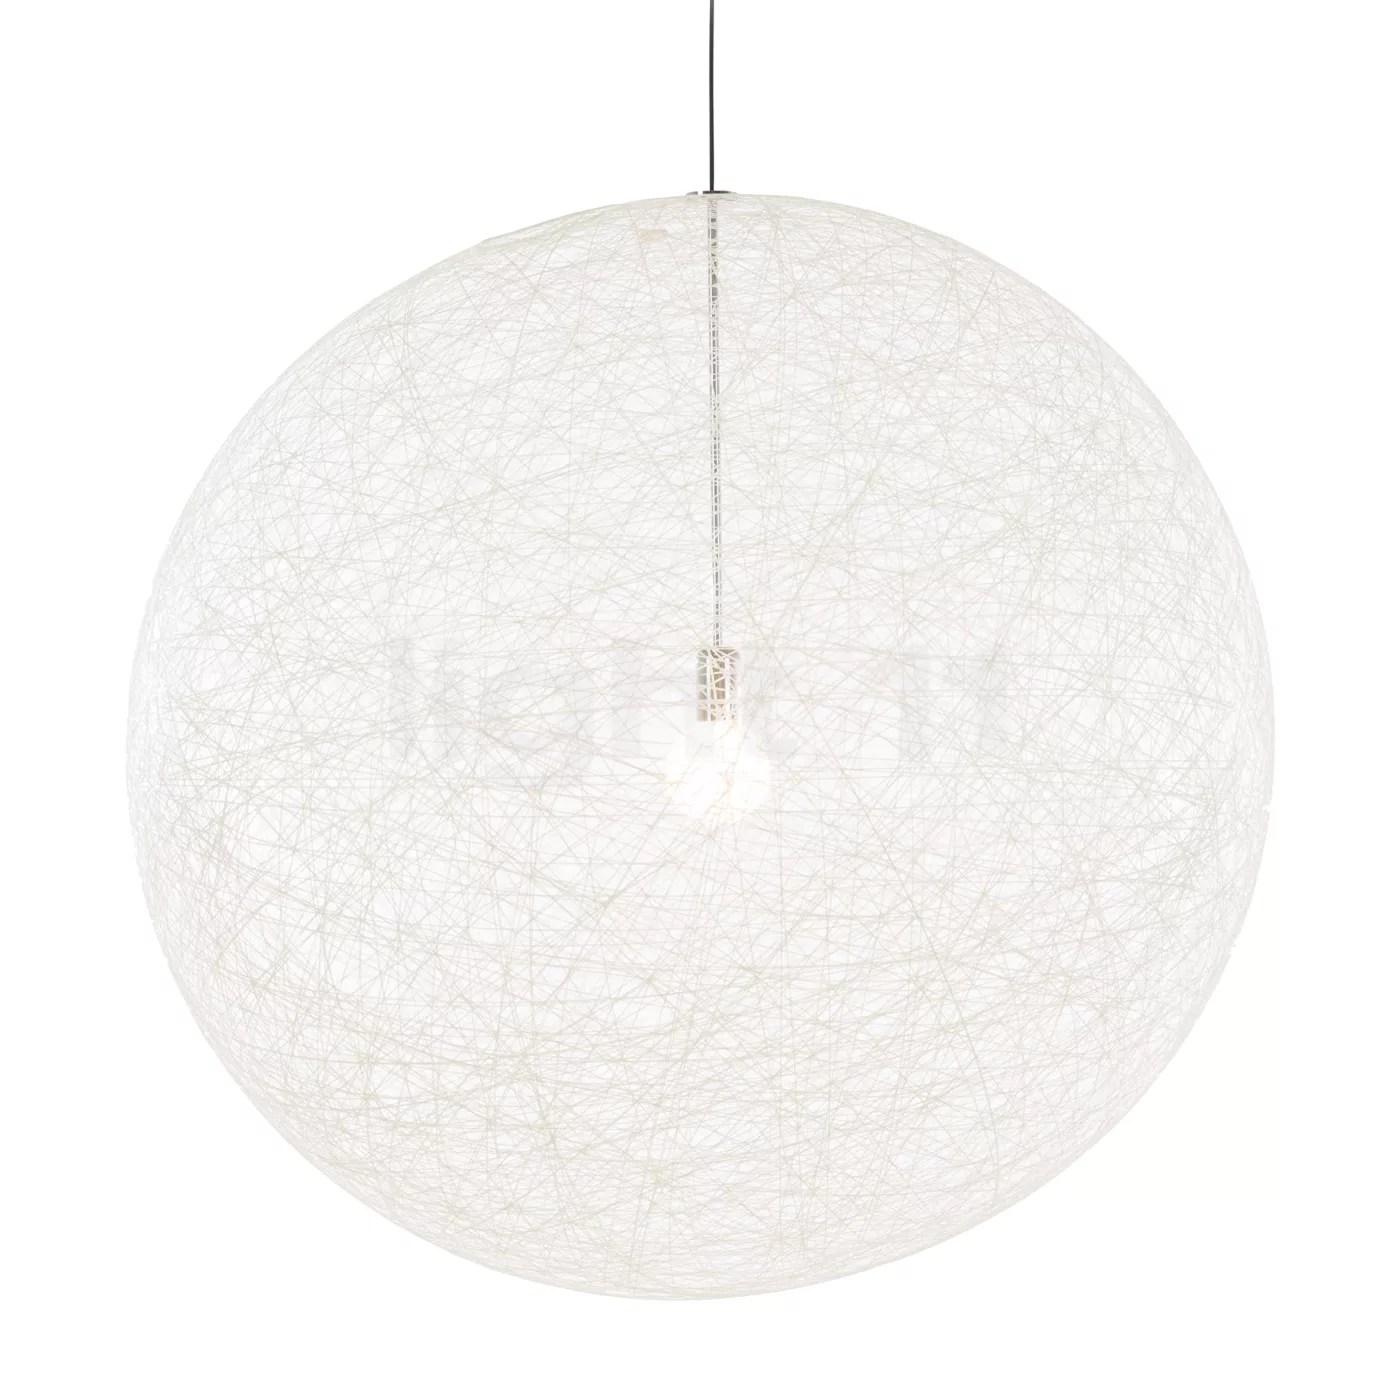 Moooi Random Light Pendant Lights At Light11